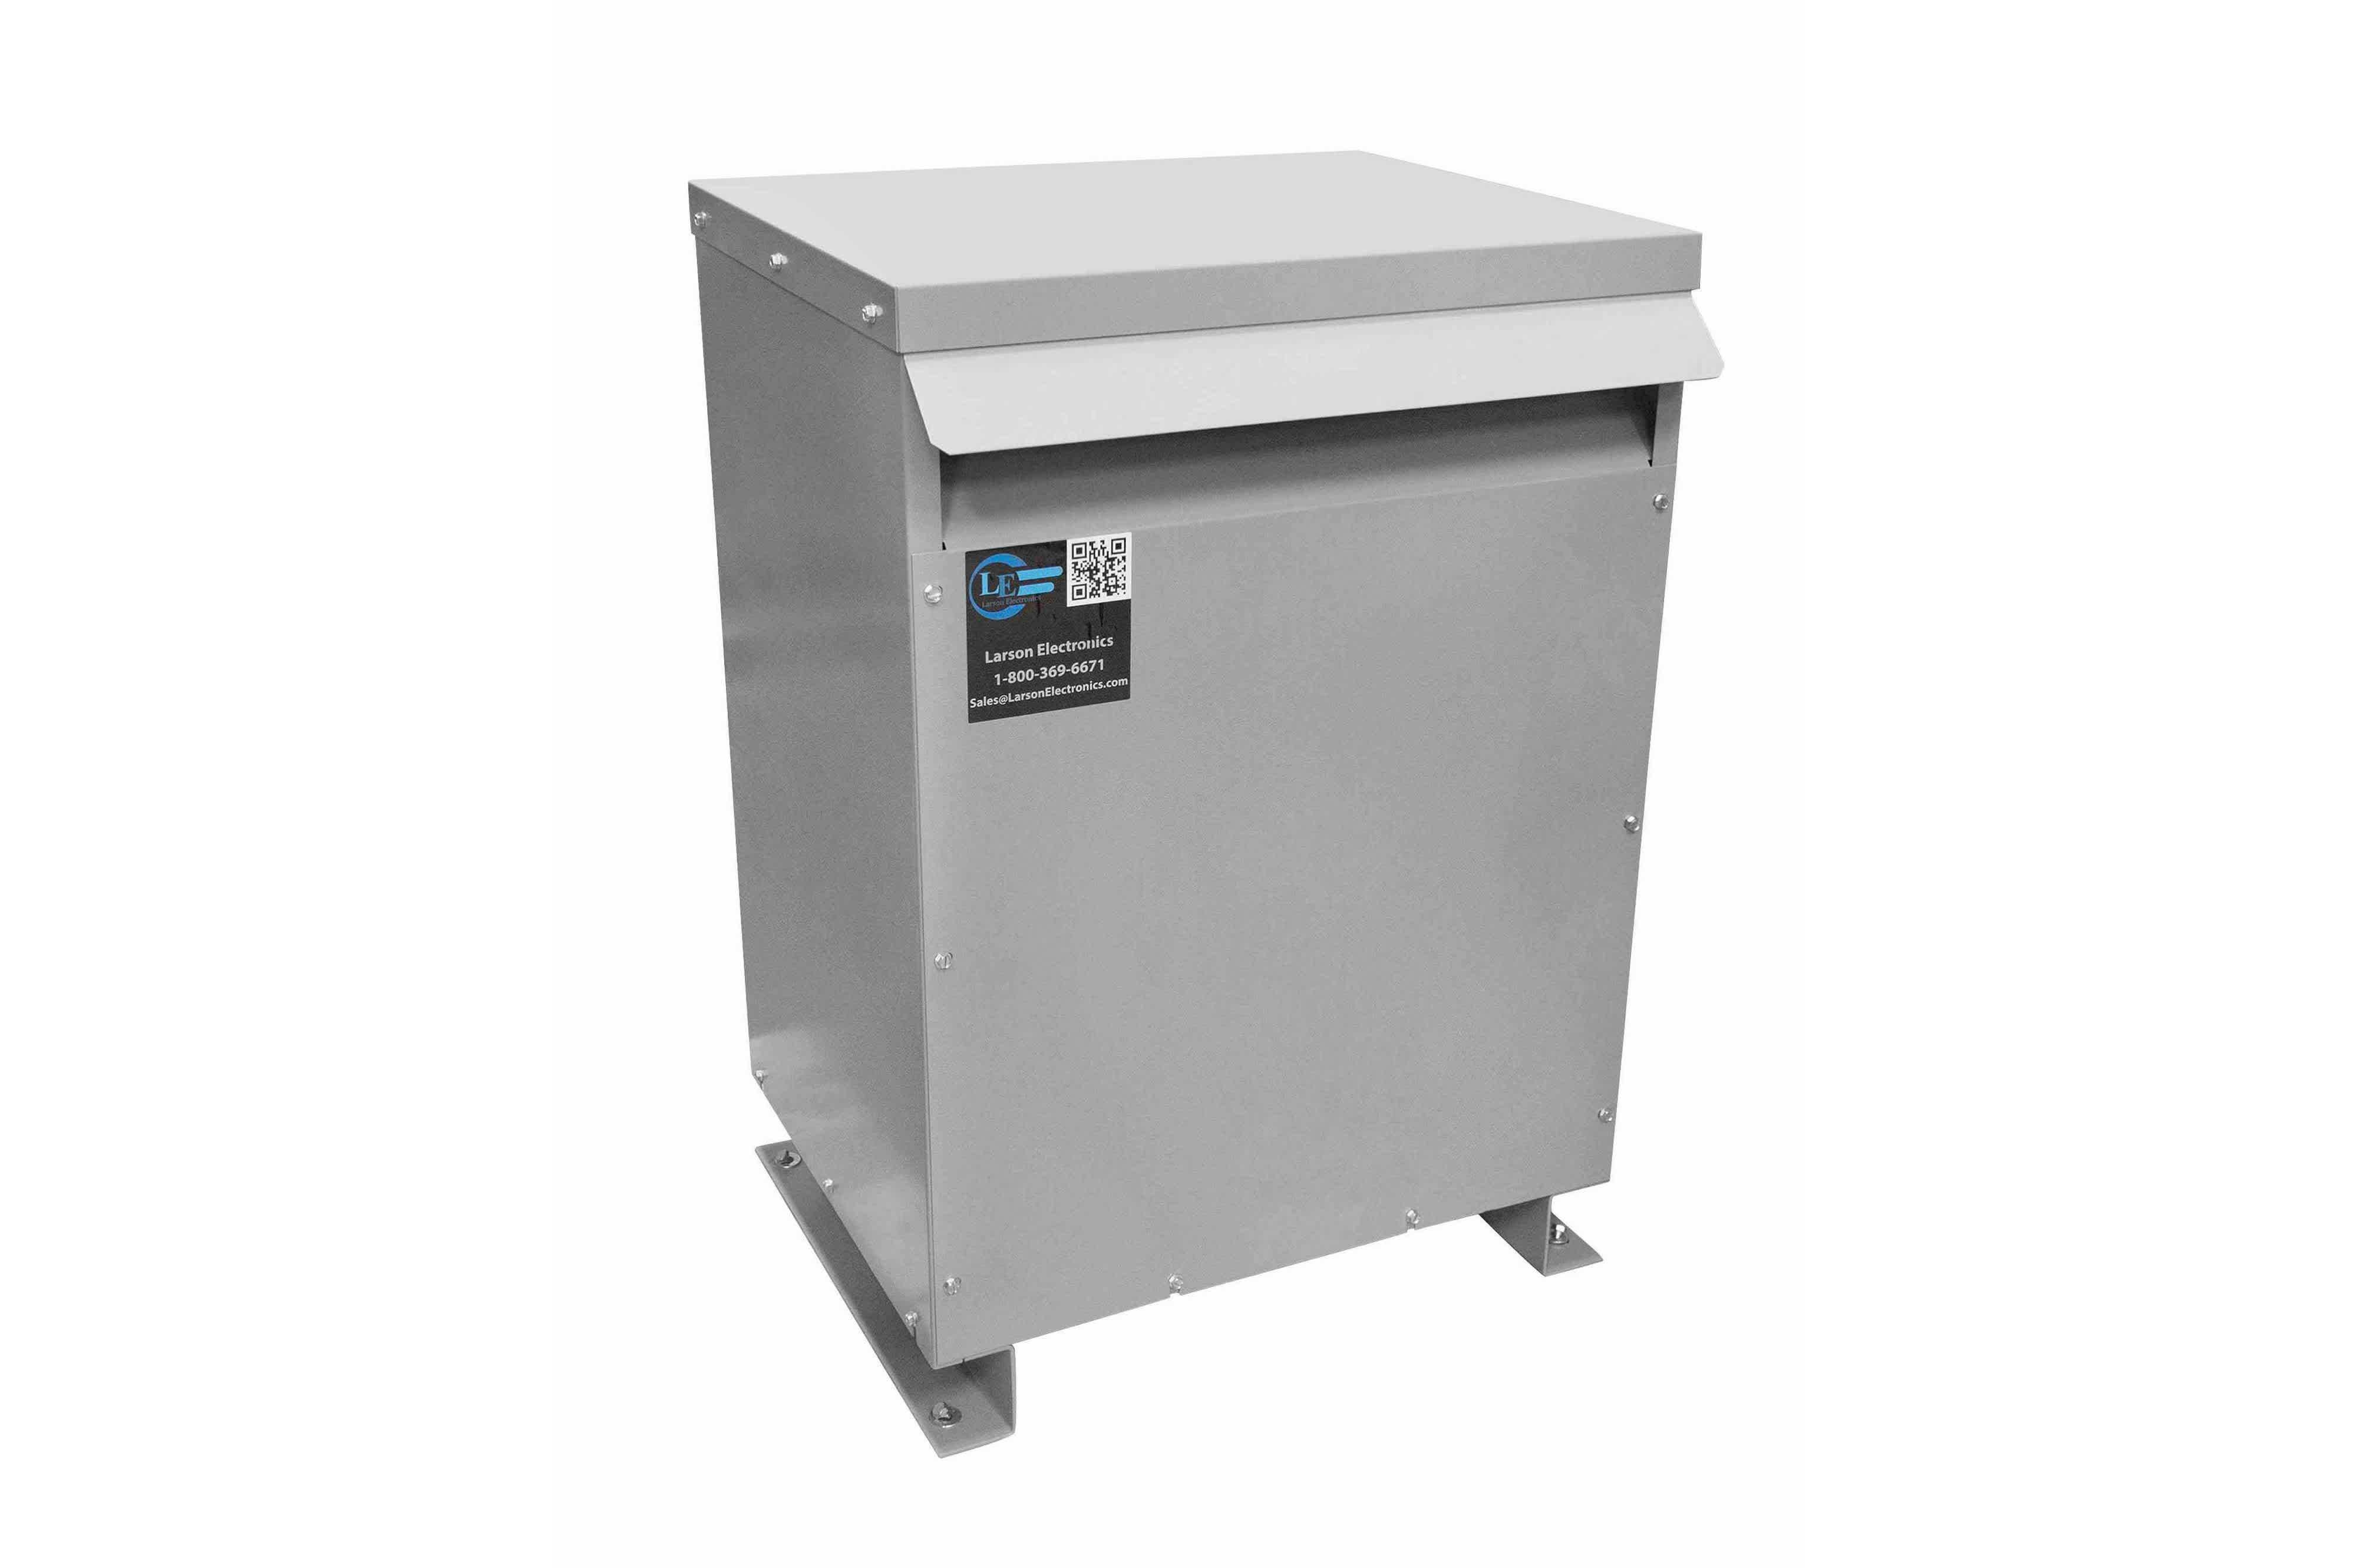 42.5 kVA 3PH Isolation Transformer, 600V Wye Primary, 208Y/120 Wye-N Secondary, N3R, Ventilated, 60 Hz